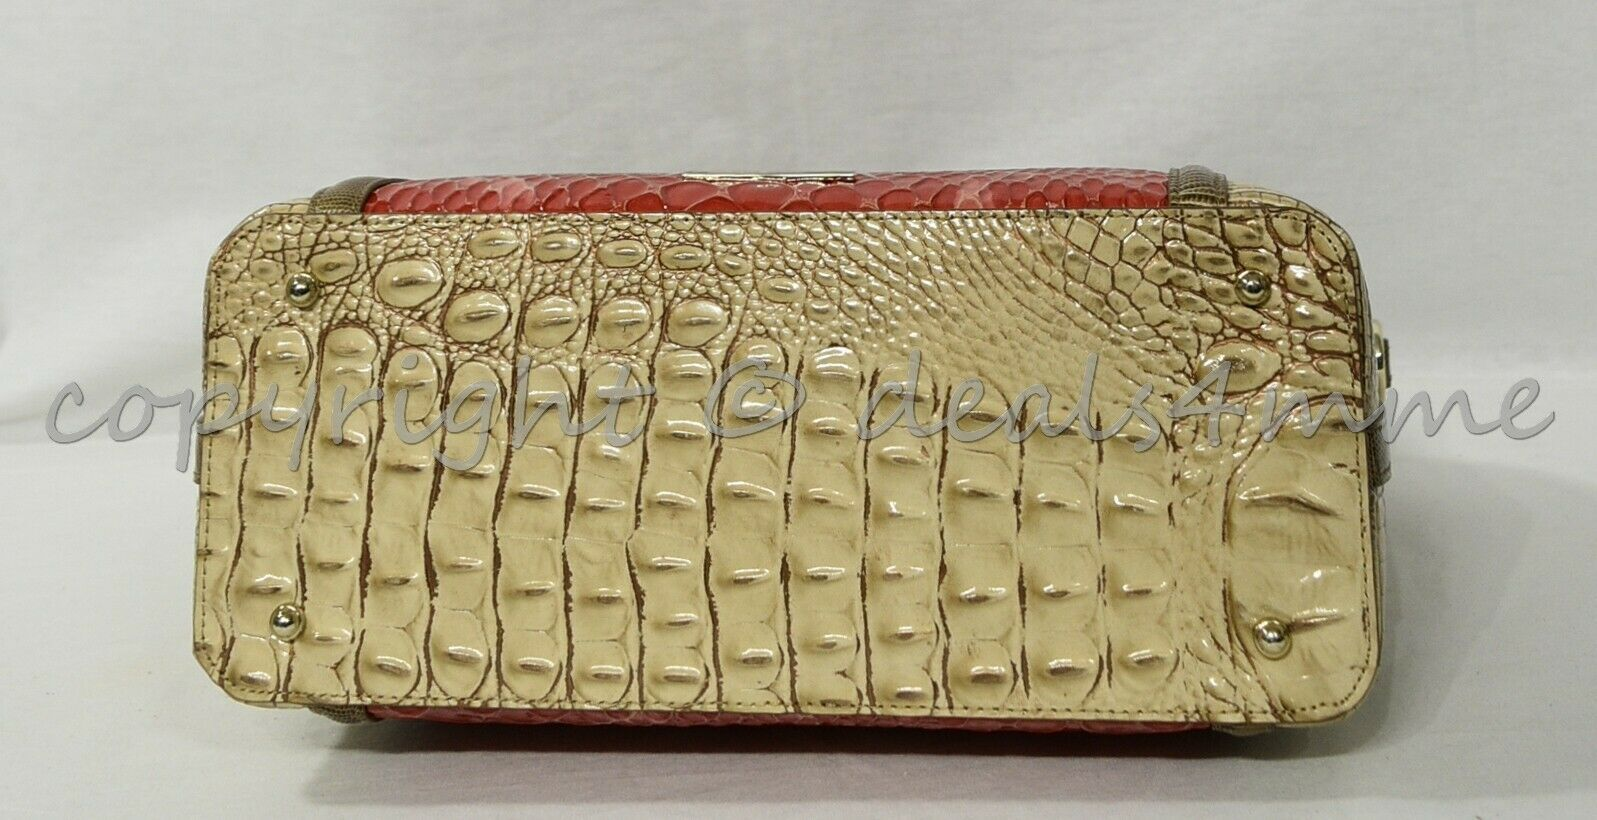 NWT Brahmin Large Duxbury Satchel/Shoulder Bag in Candy Apple Carlisle image 9